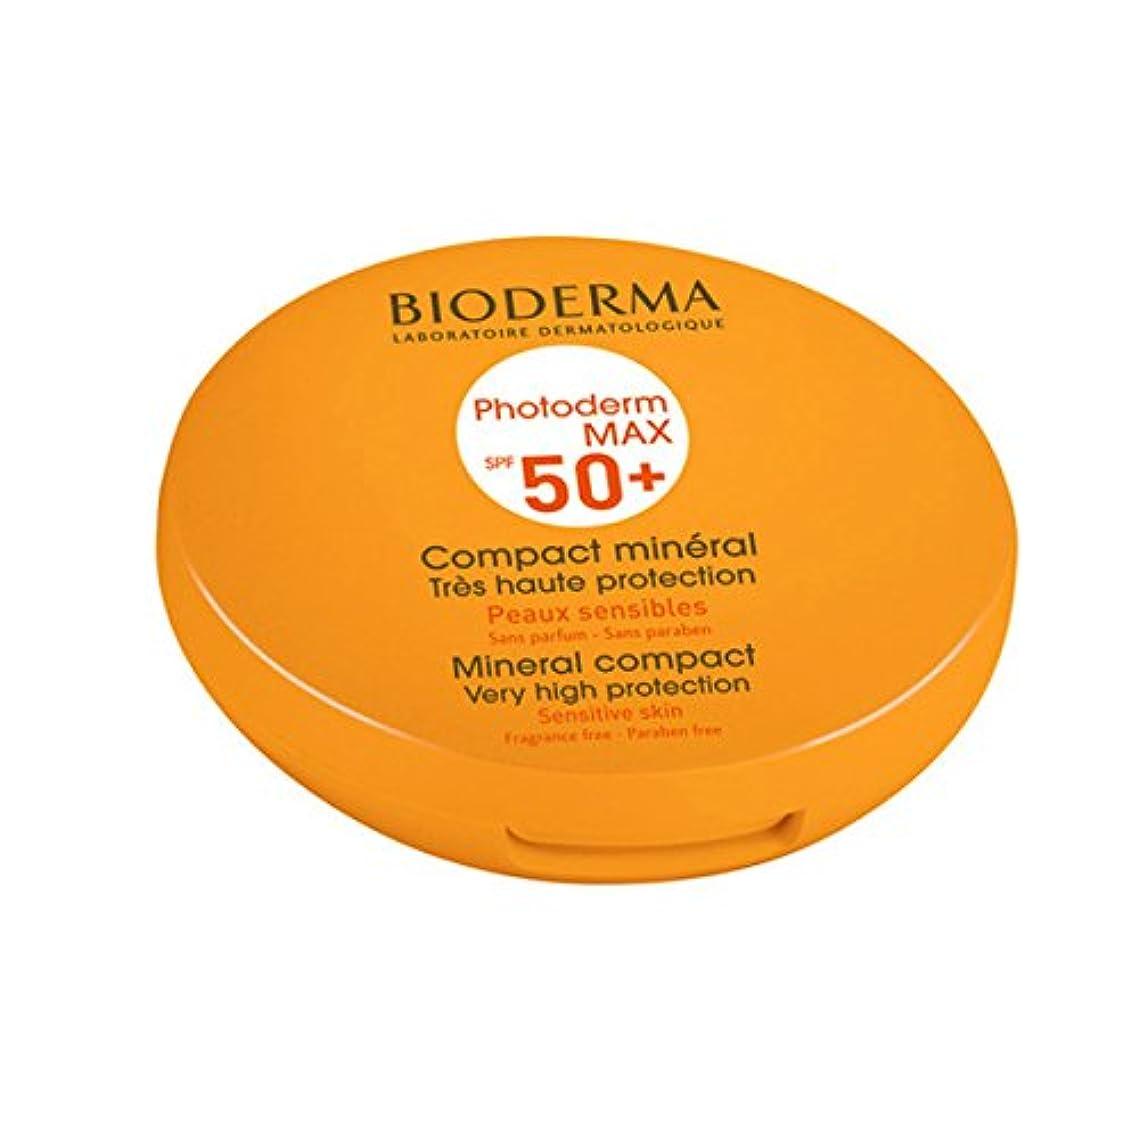 Bioderma Photoderm Max Compact Mineral 50+ Golden 10g [並行輸入品]